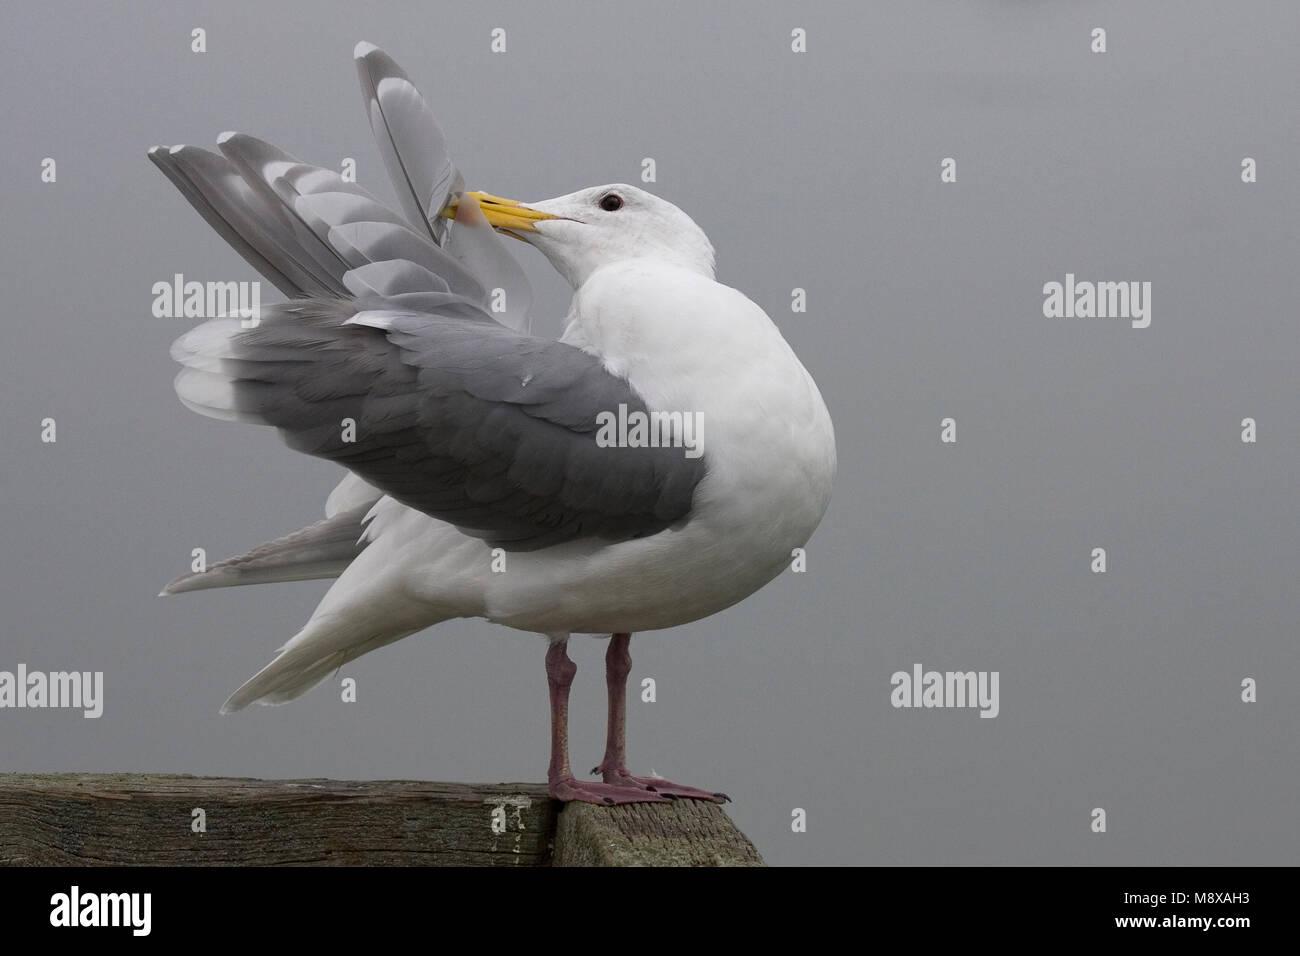 Beringmeeuw poetsend; Glaucous-winged Gull preening - Stock Image